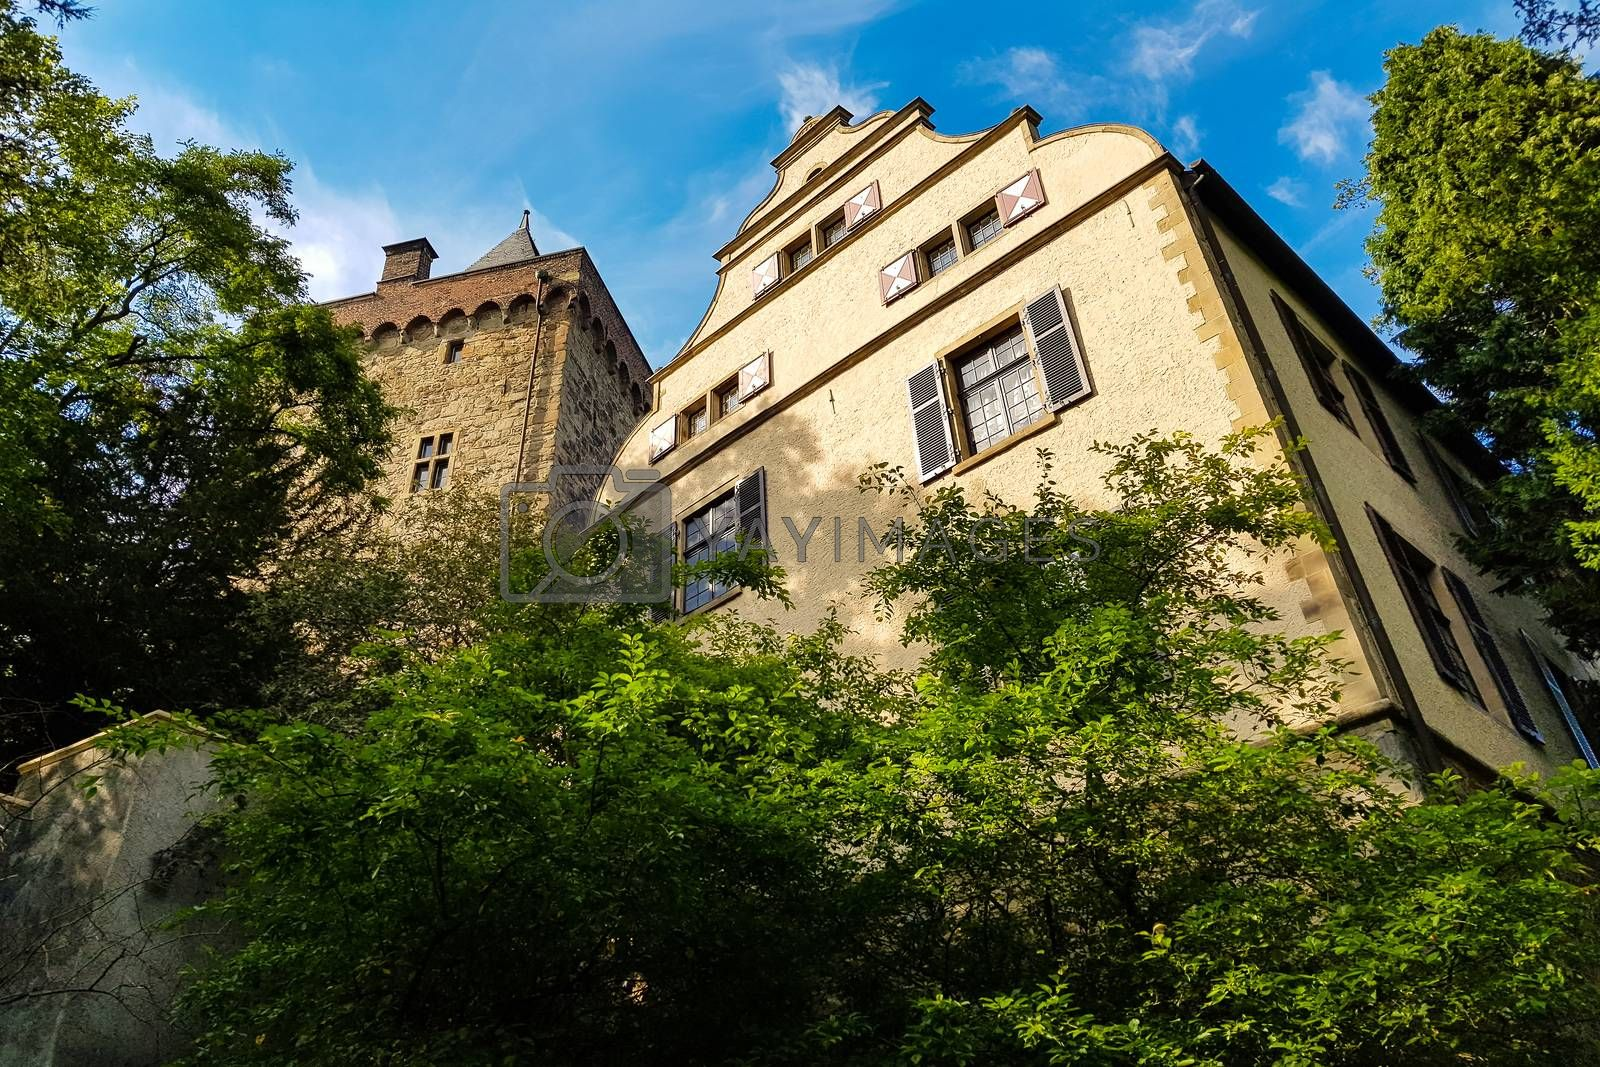 The medieval castle Schloss Landsberg in Germany